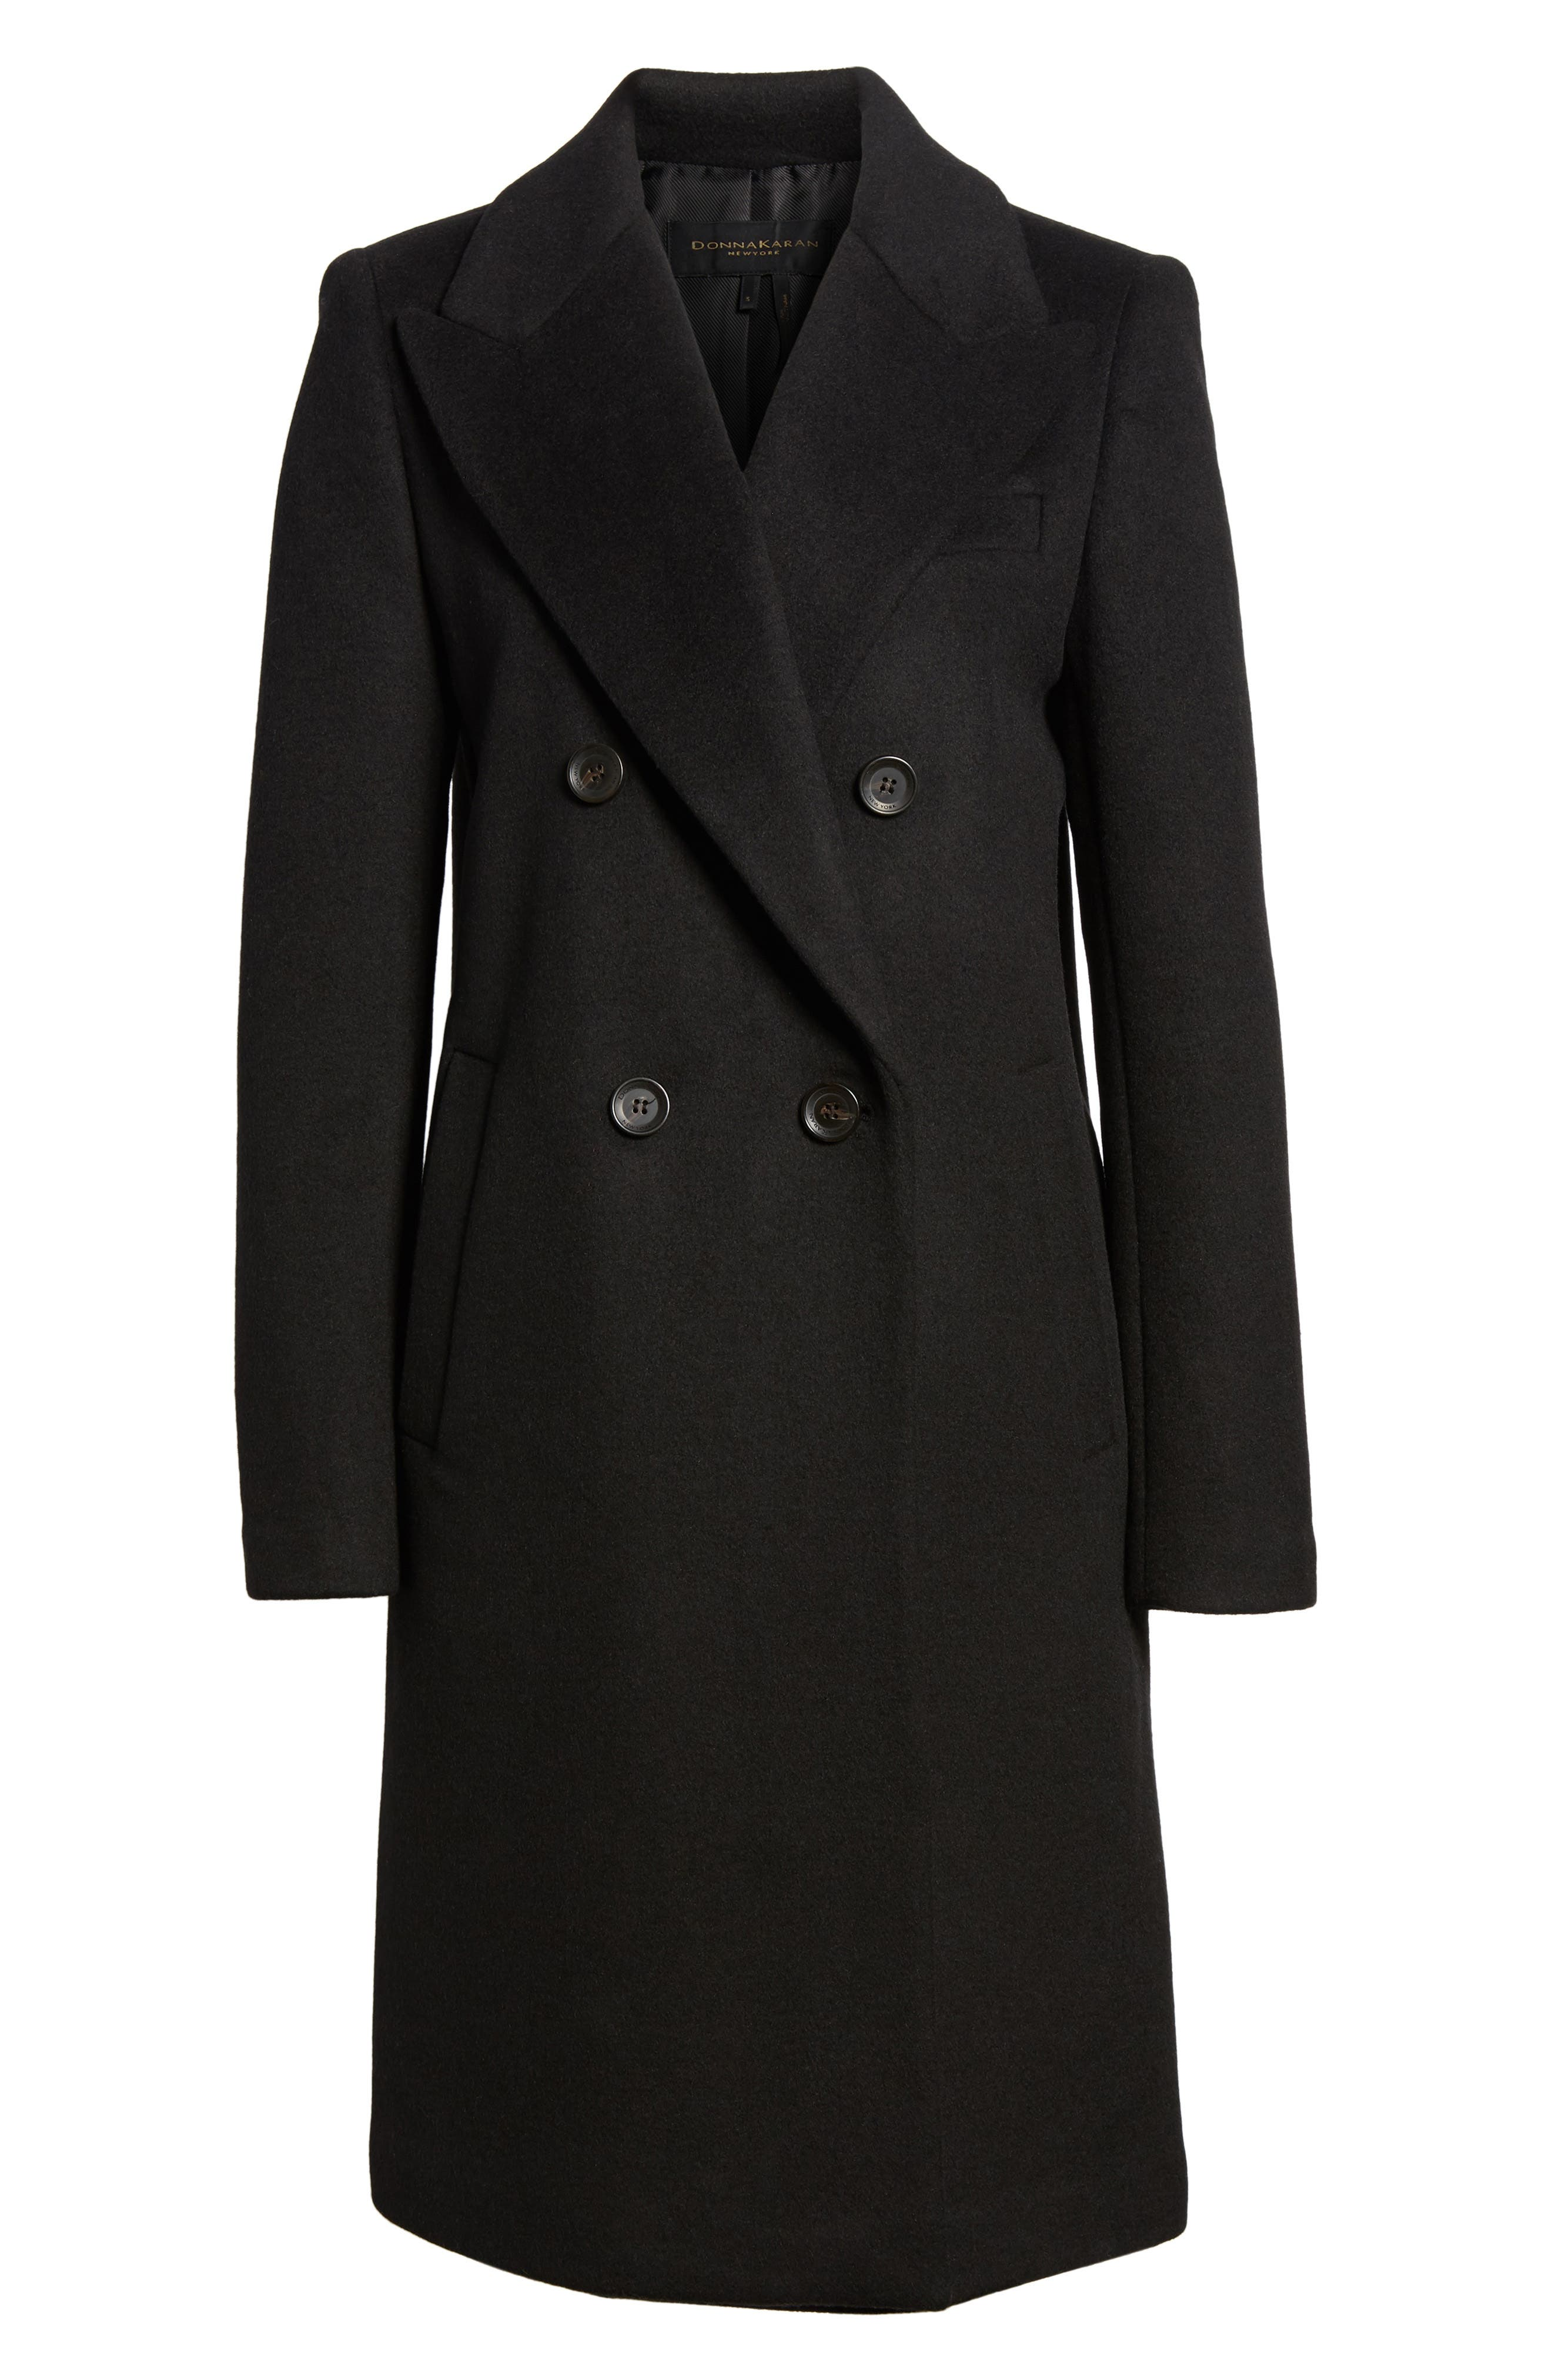 DKNY Lavish Wool Blend Coat,                             Alternate thumbnail 5, color,                             001